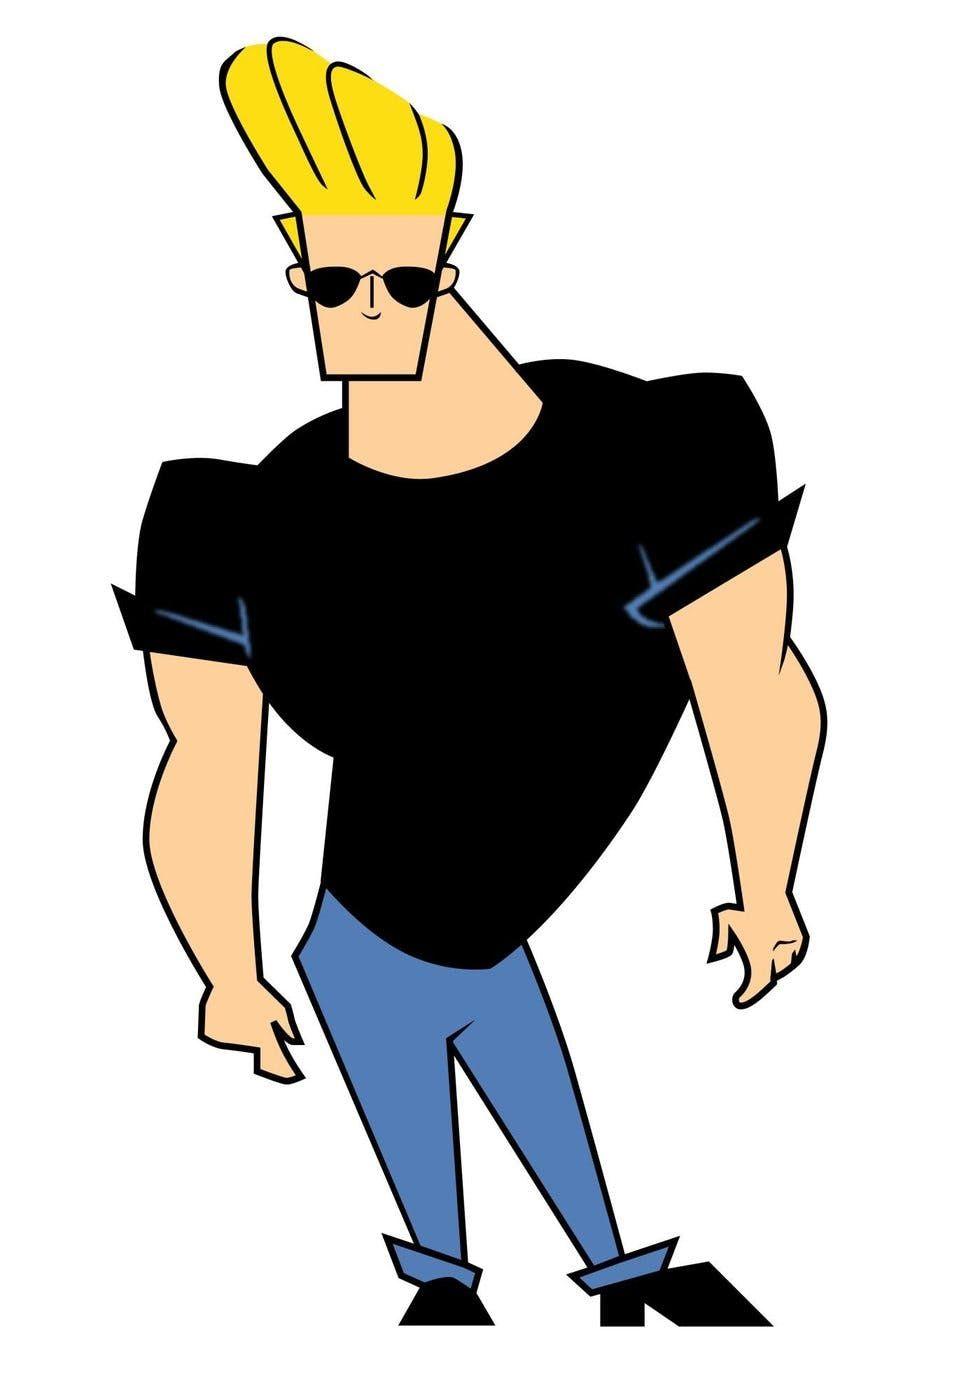 Pin By On Characters Beard Cartoon Johnny Bravo Cartoon Character Costume